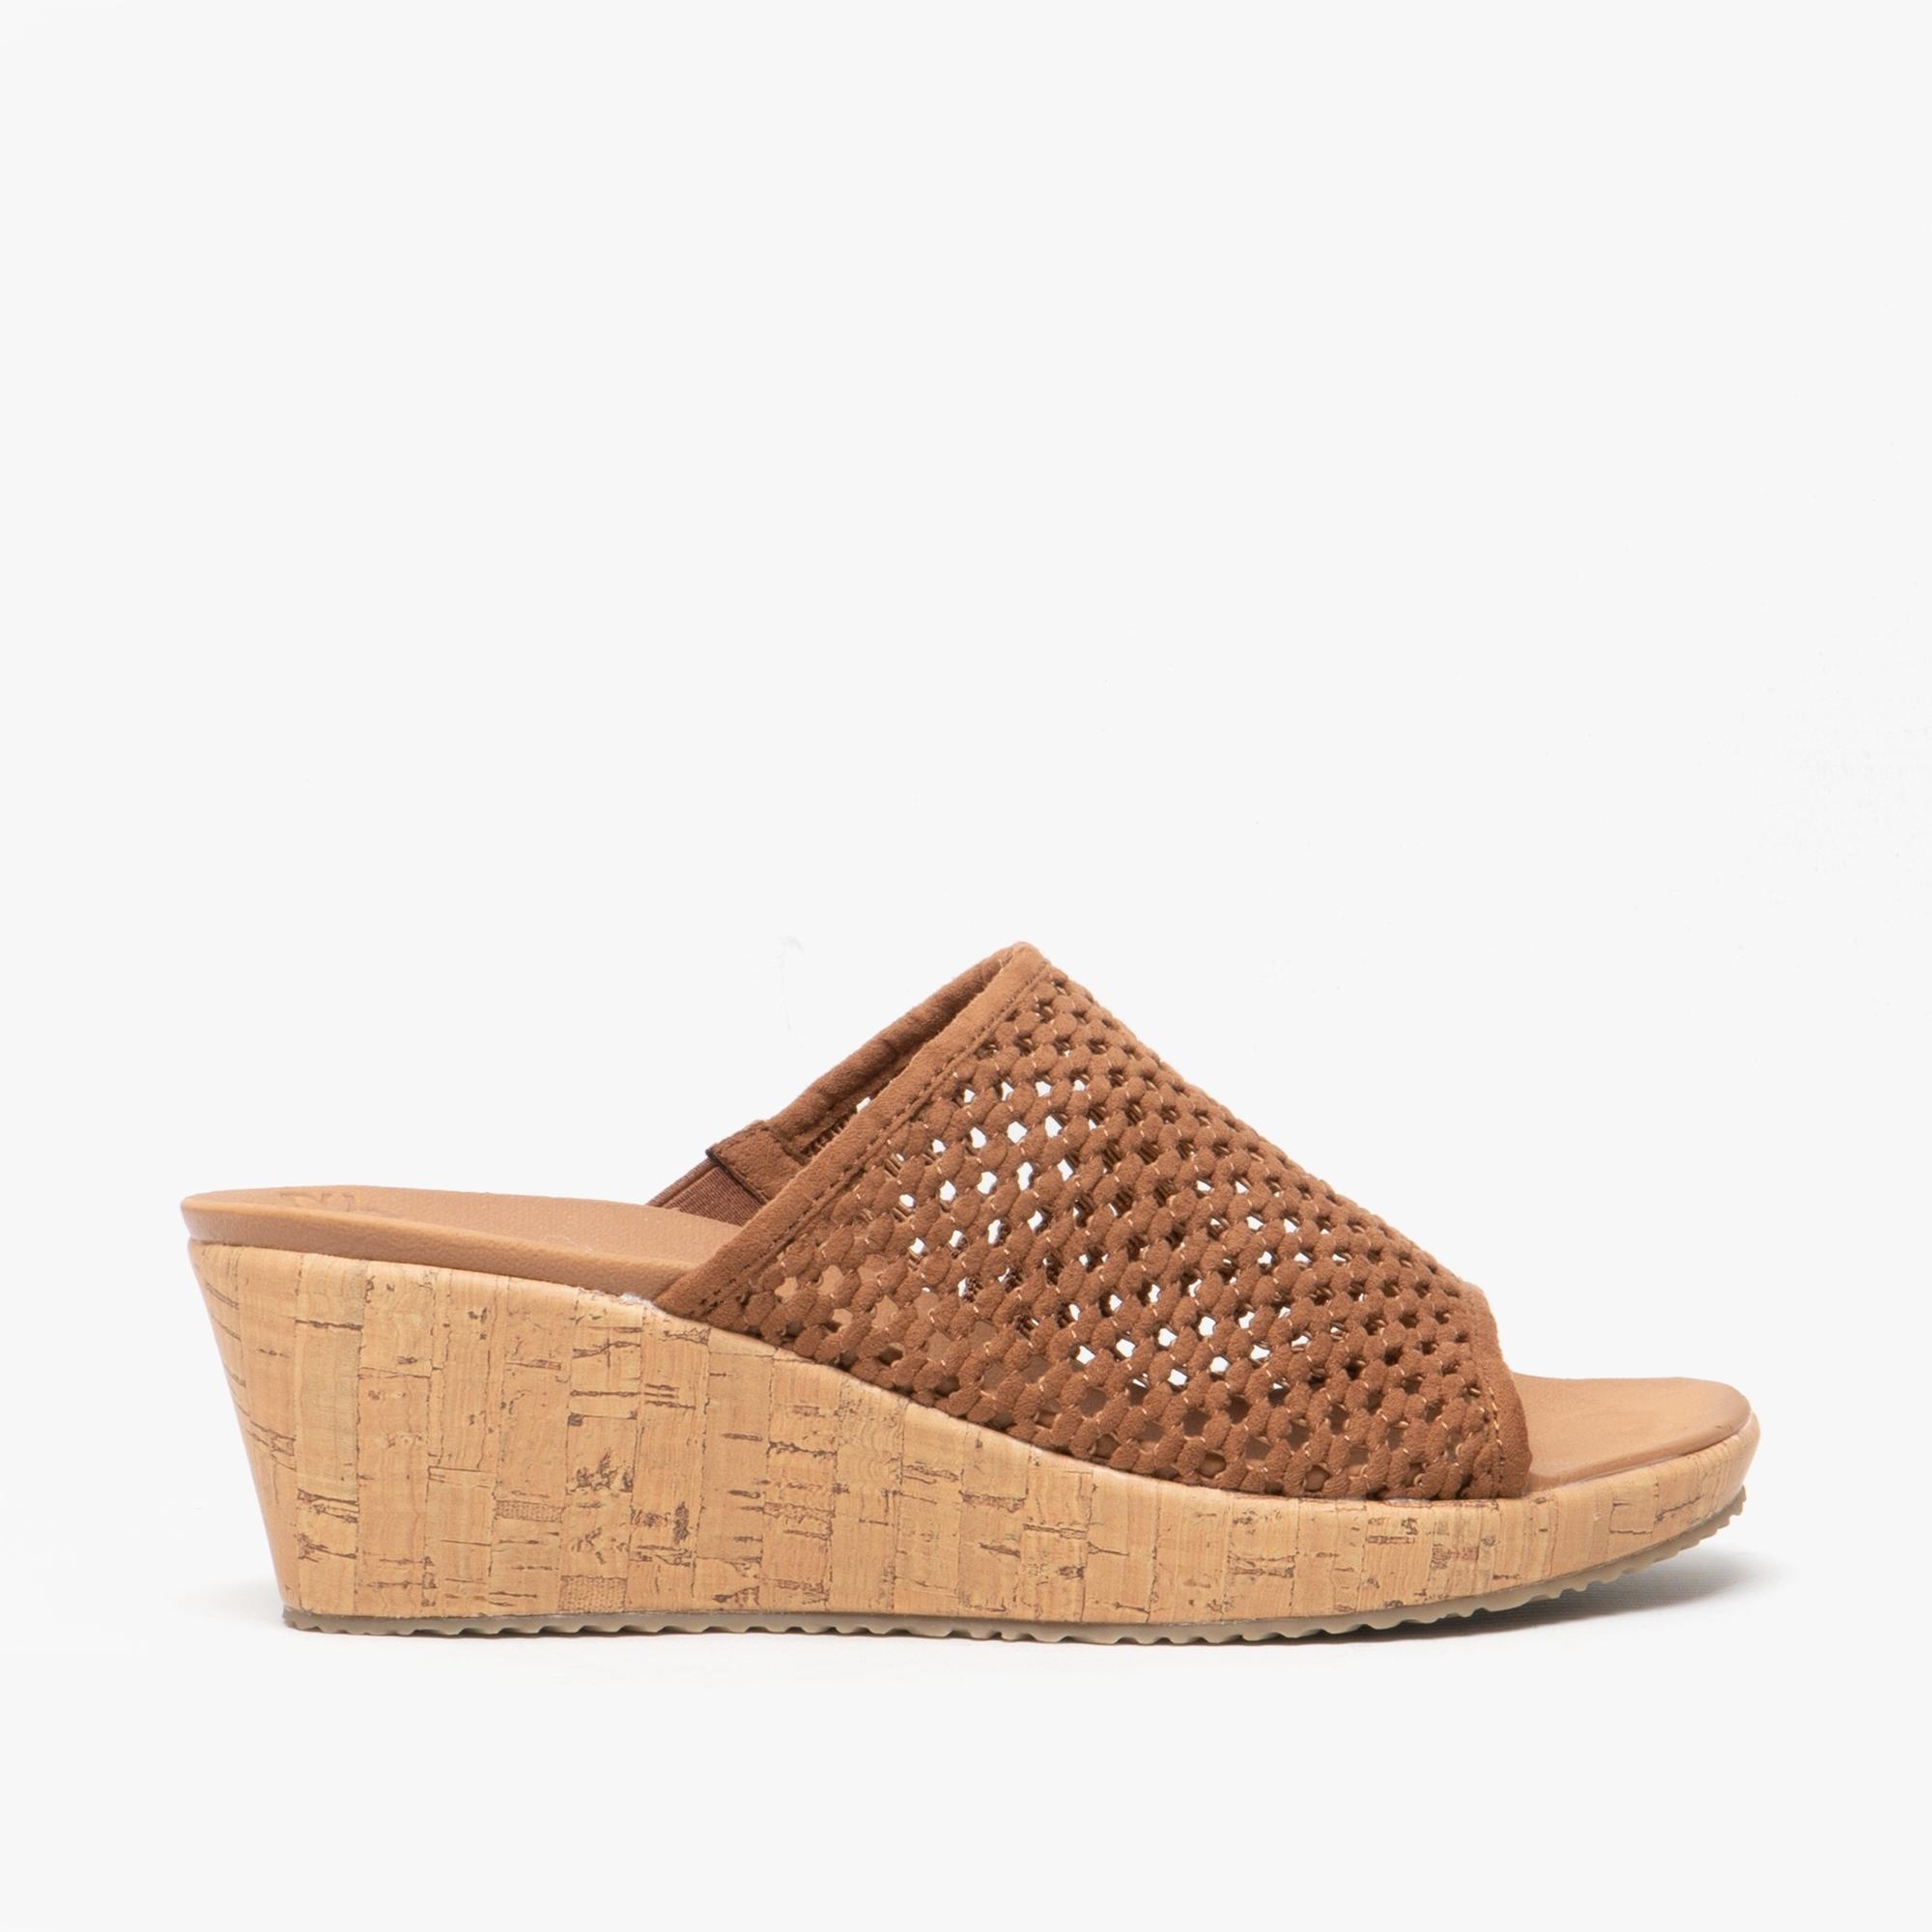 GOLDEN SKY Ladies Wedge Mule Sandals